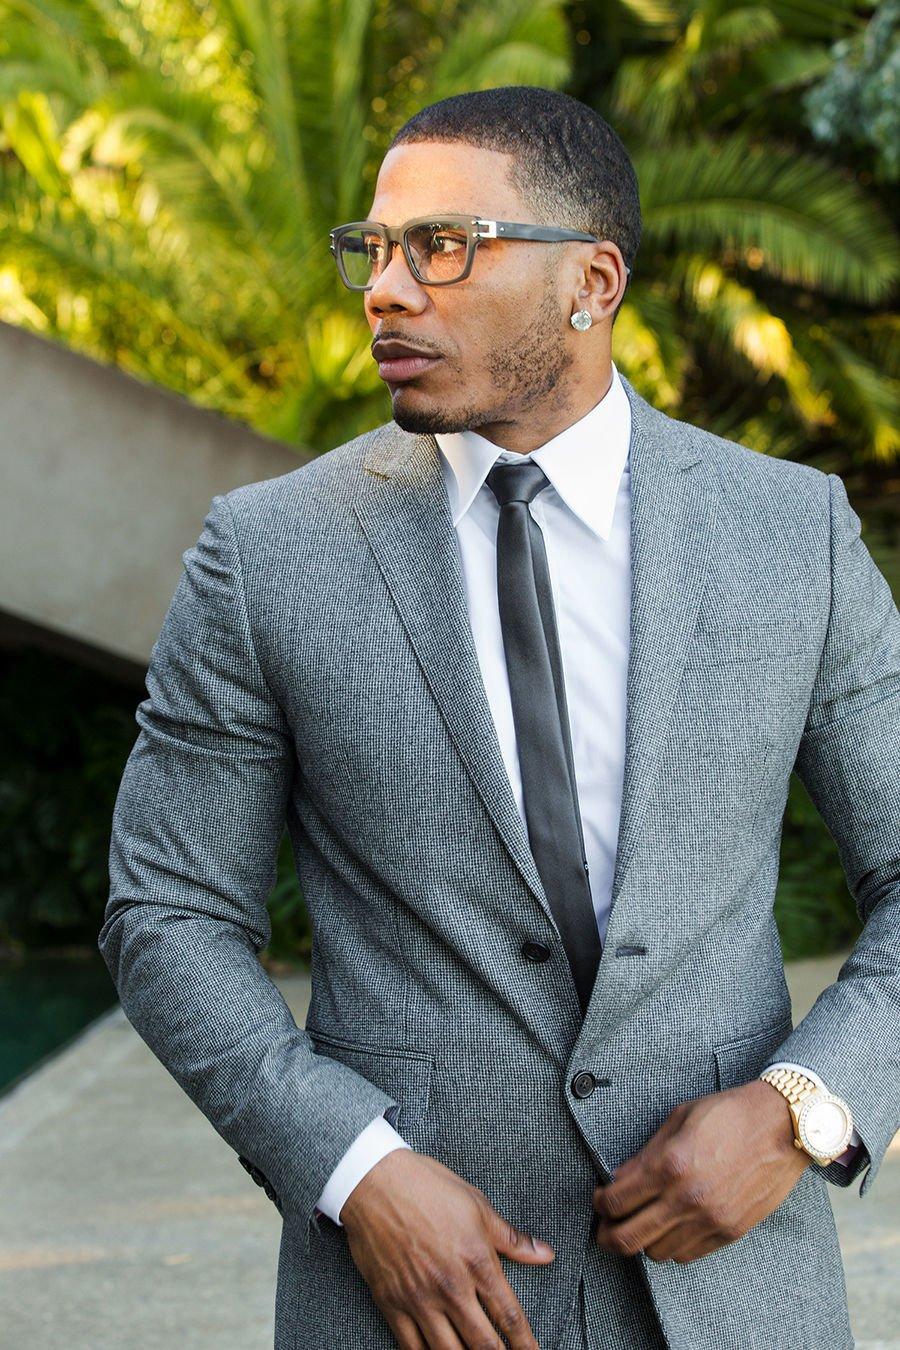 Grammy Award winner Nelly